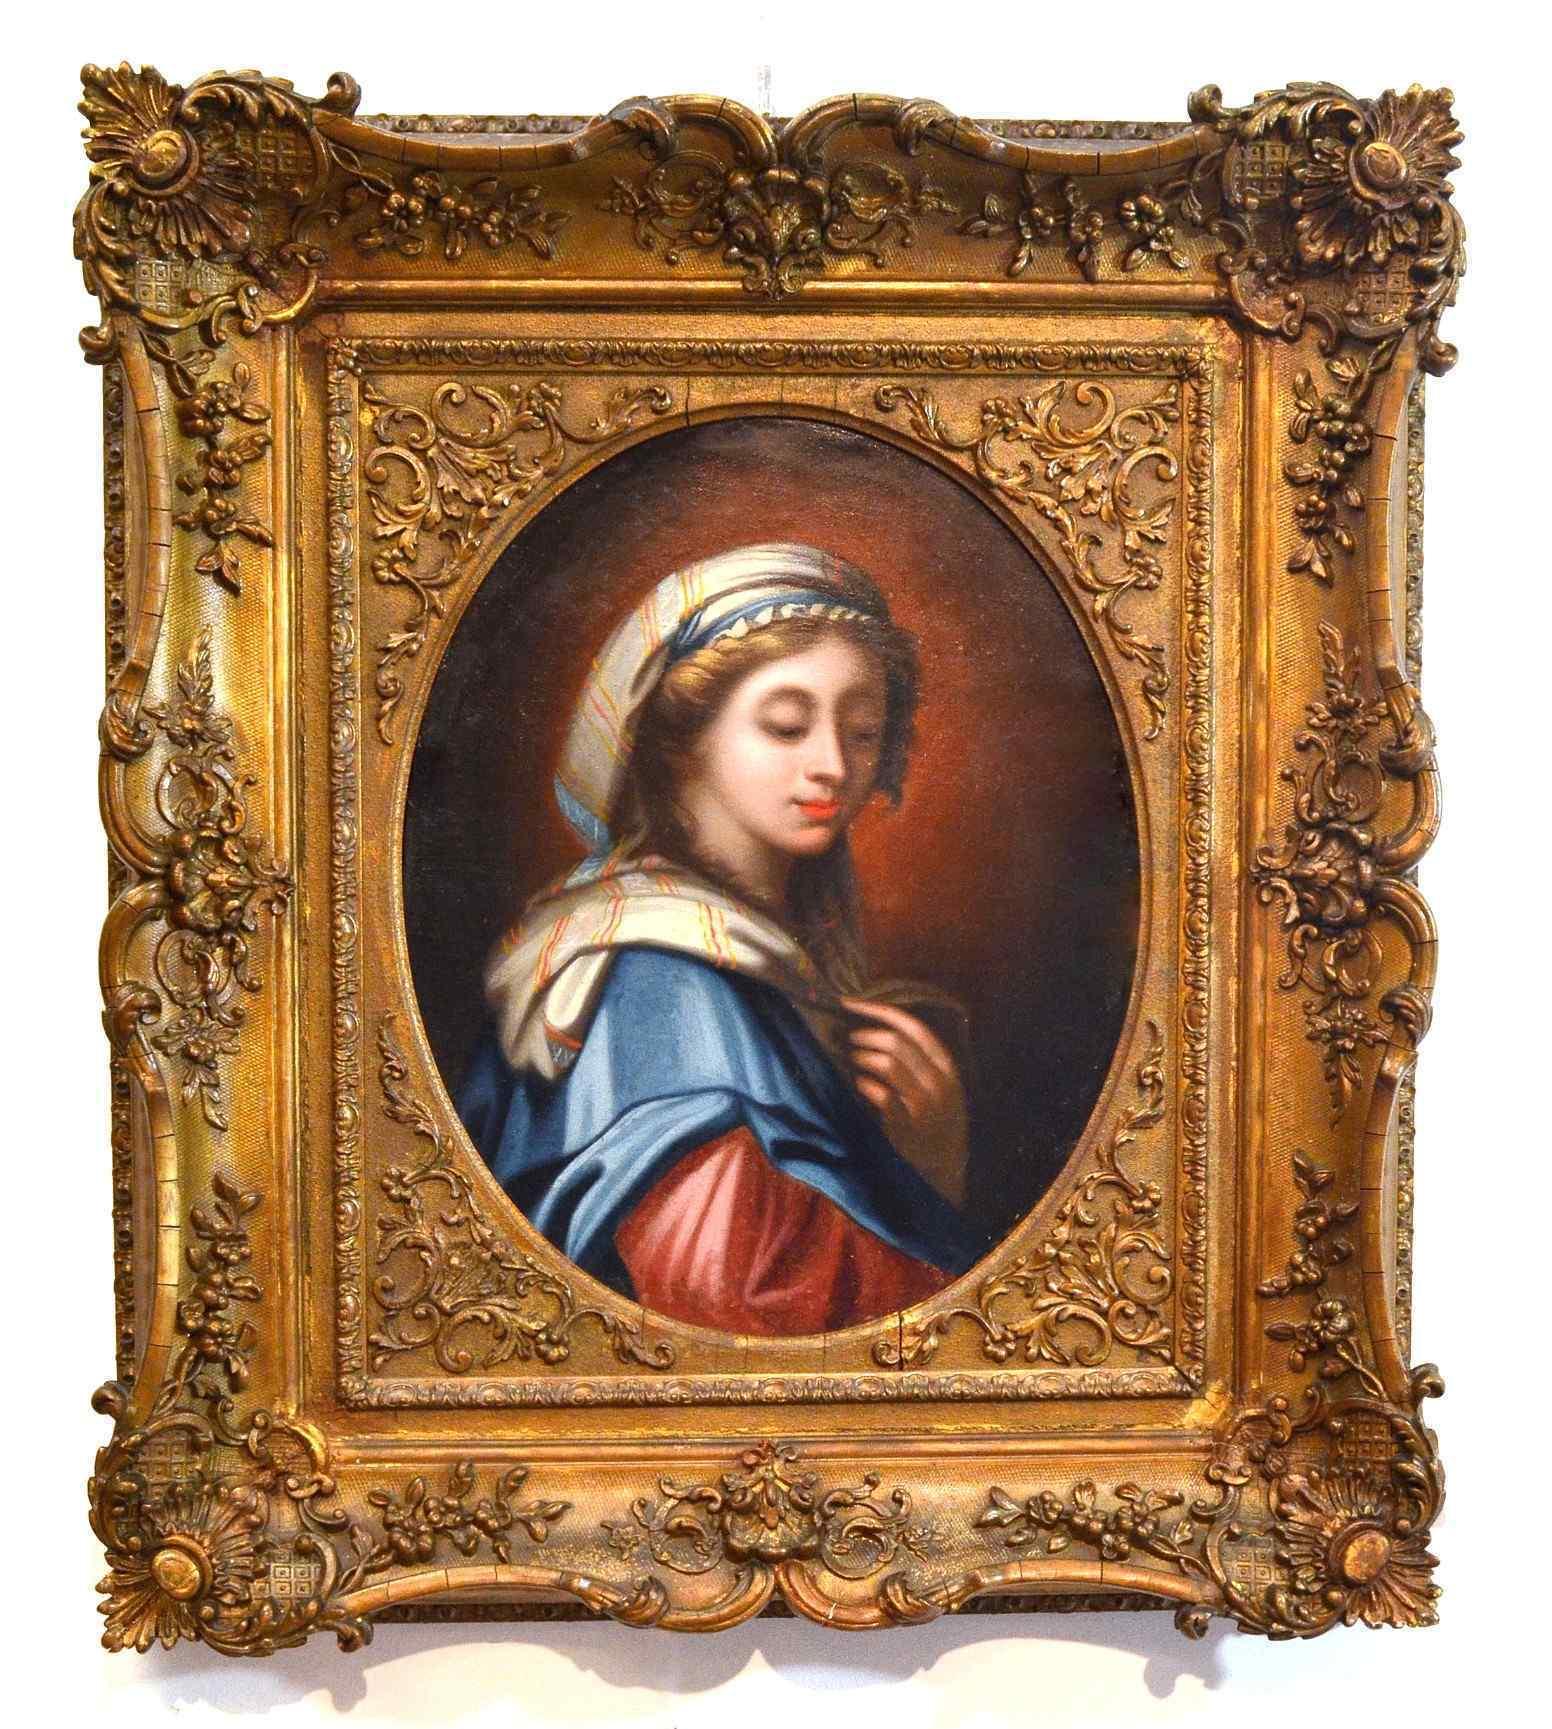 Portrait of Virgin, attr. Onorio Marinari, XVIII secolo